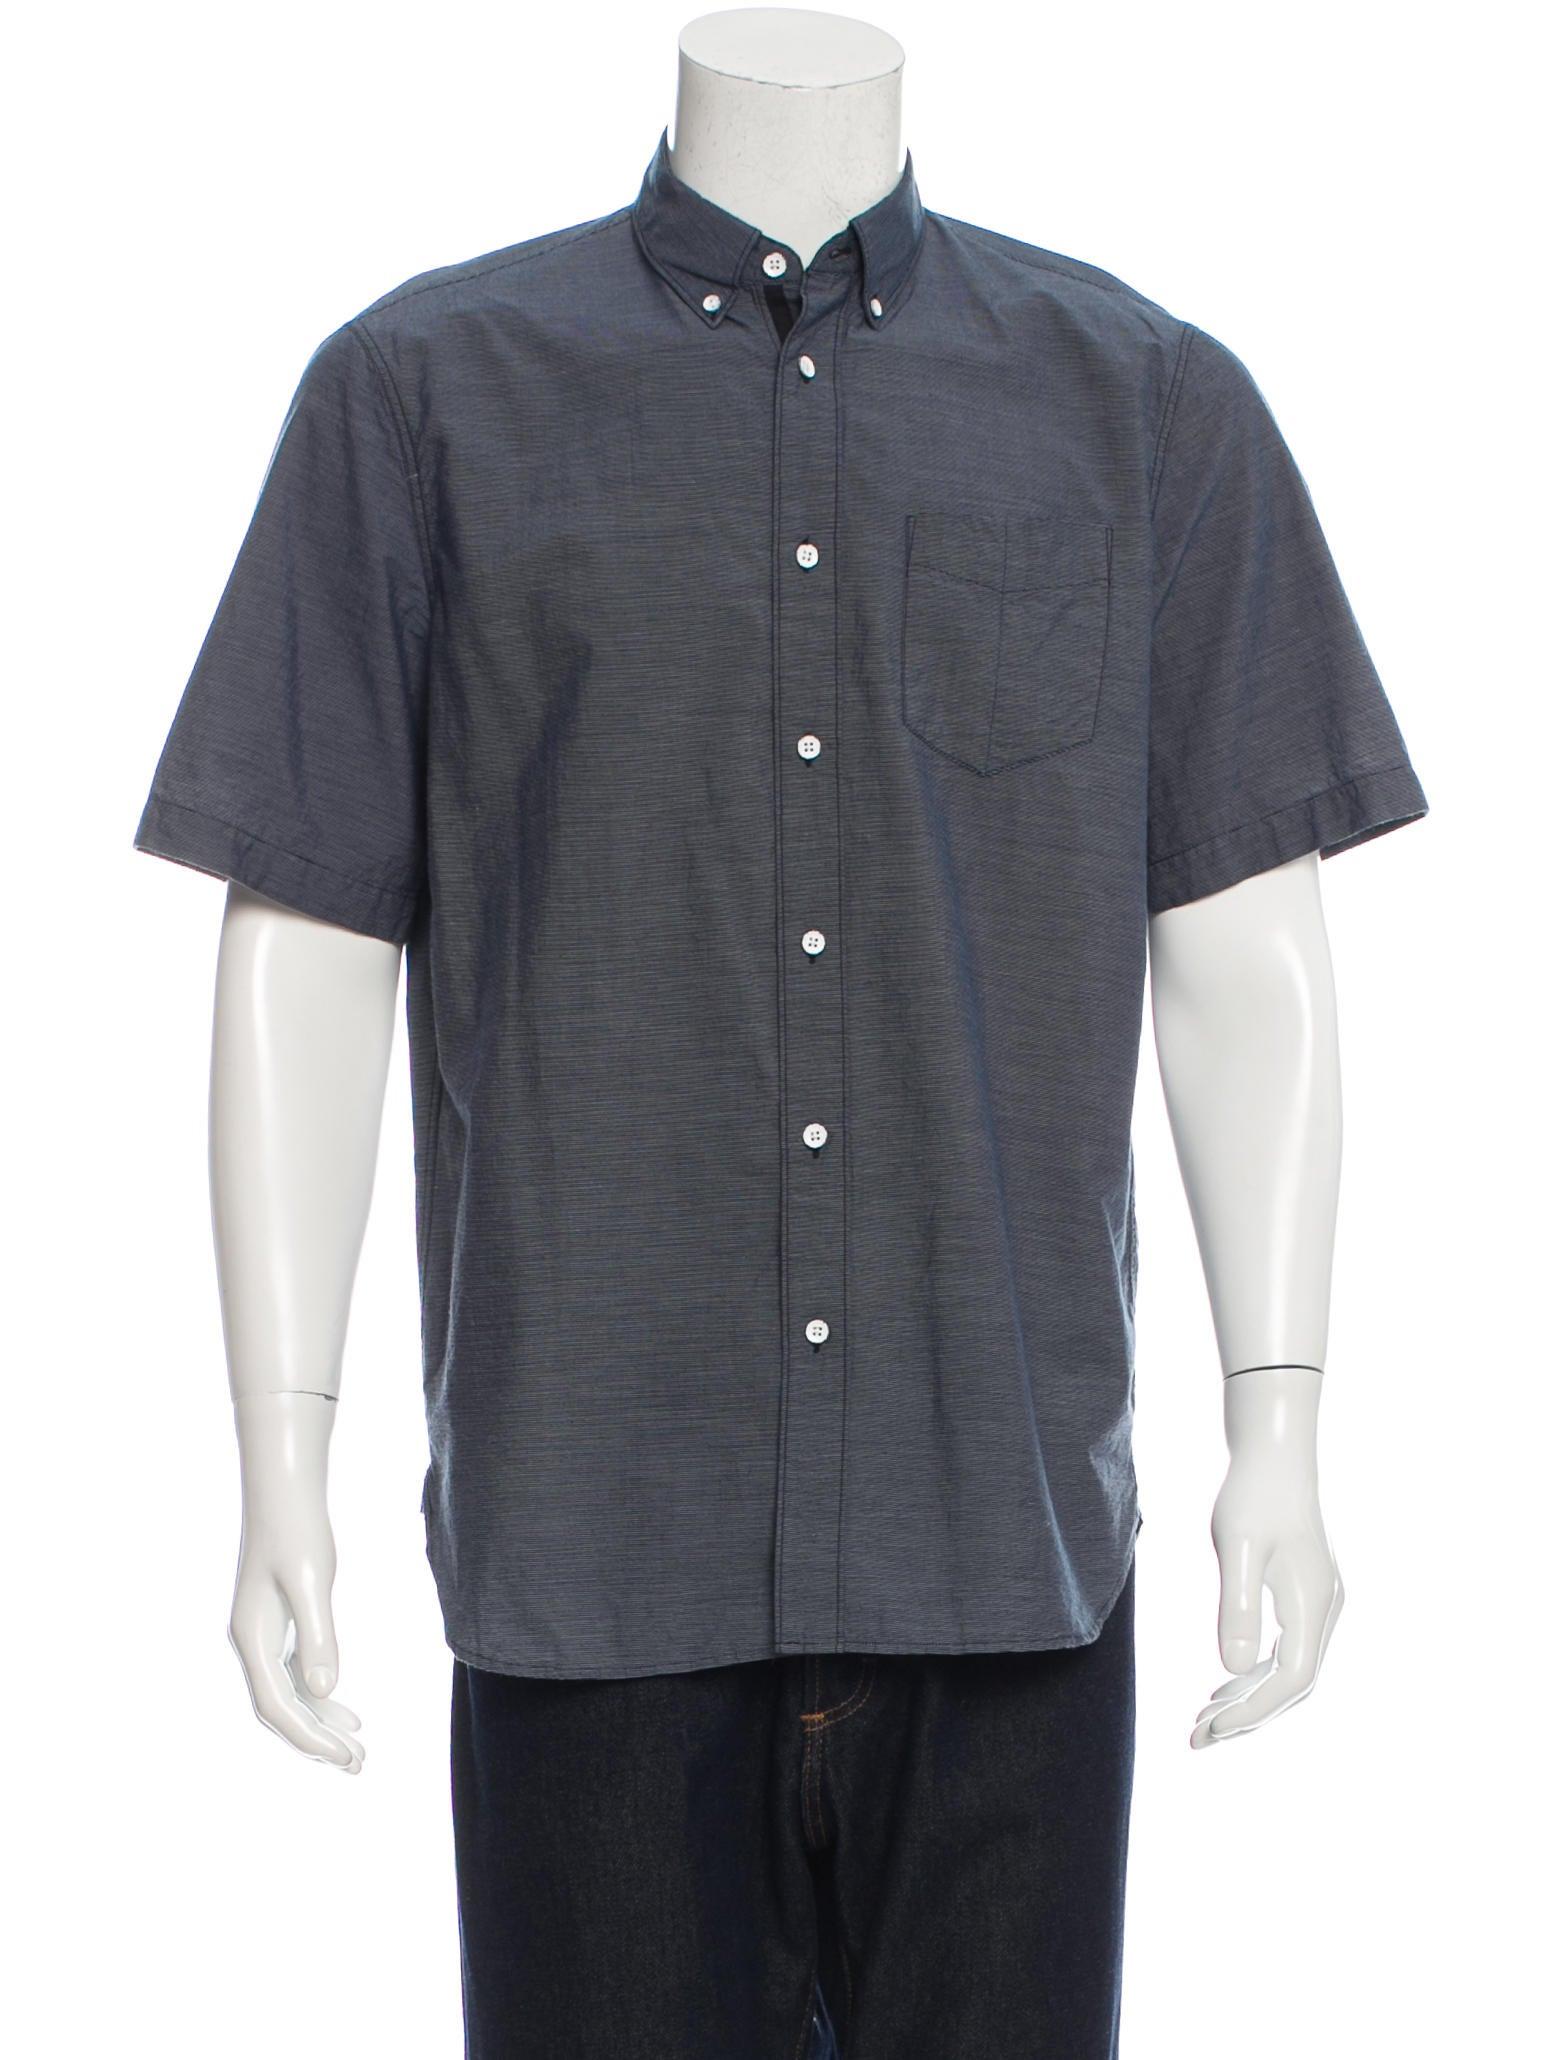 Rag bone slim fit button up shirt clothing for Rag and bone mens shirts sale